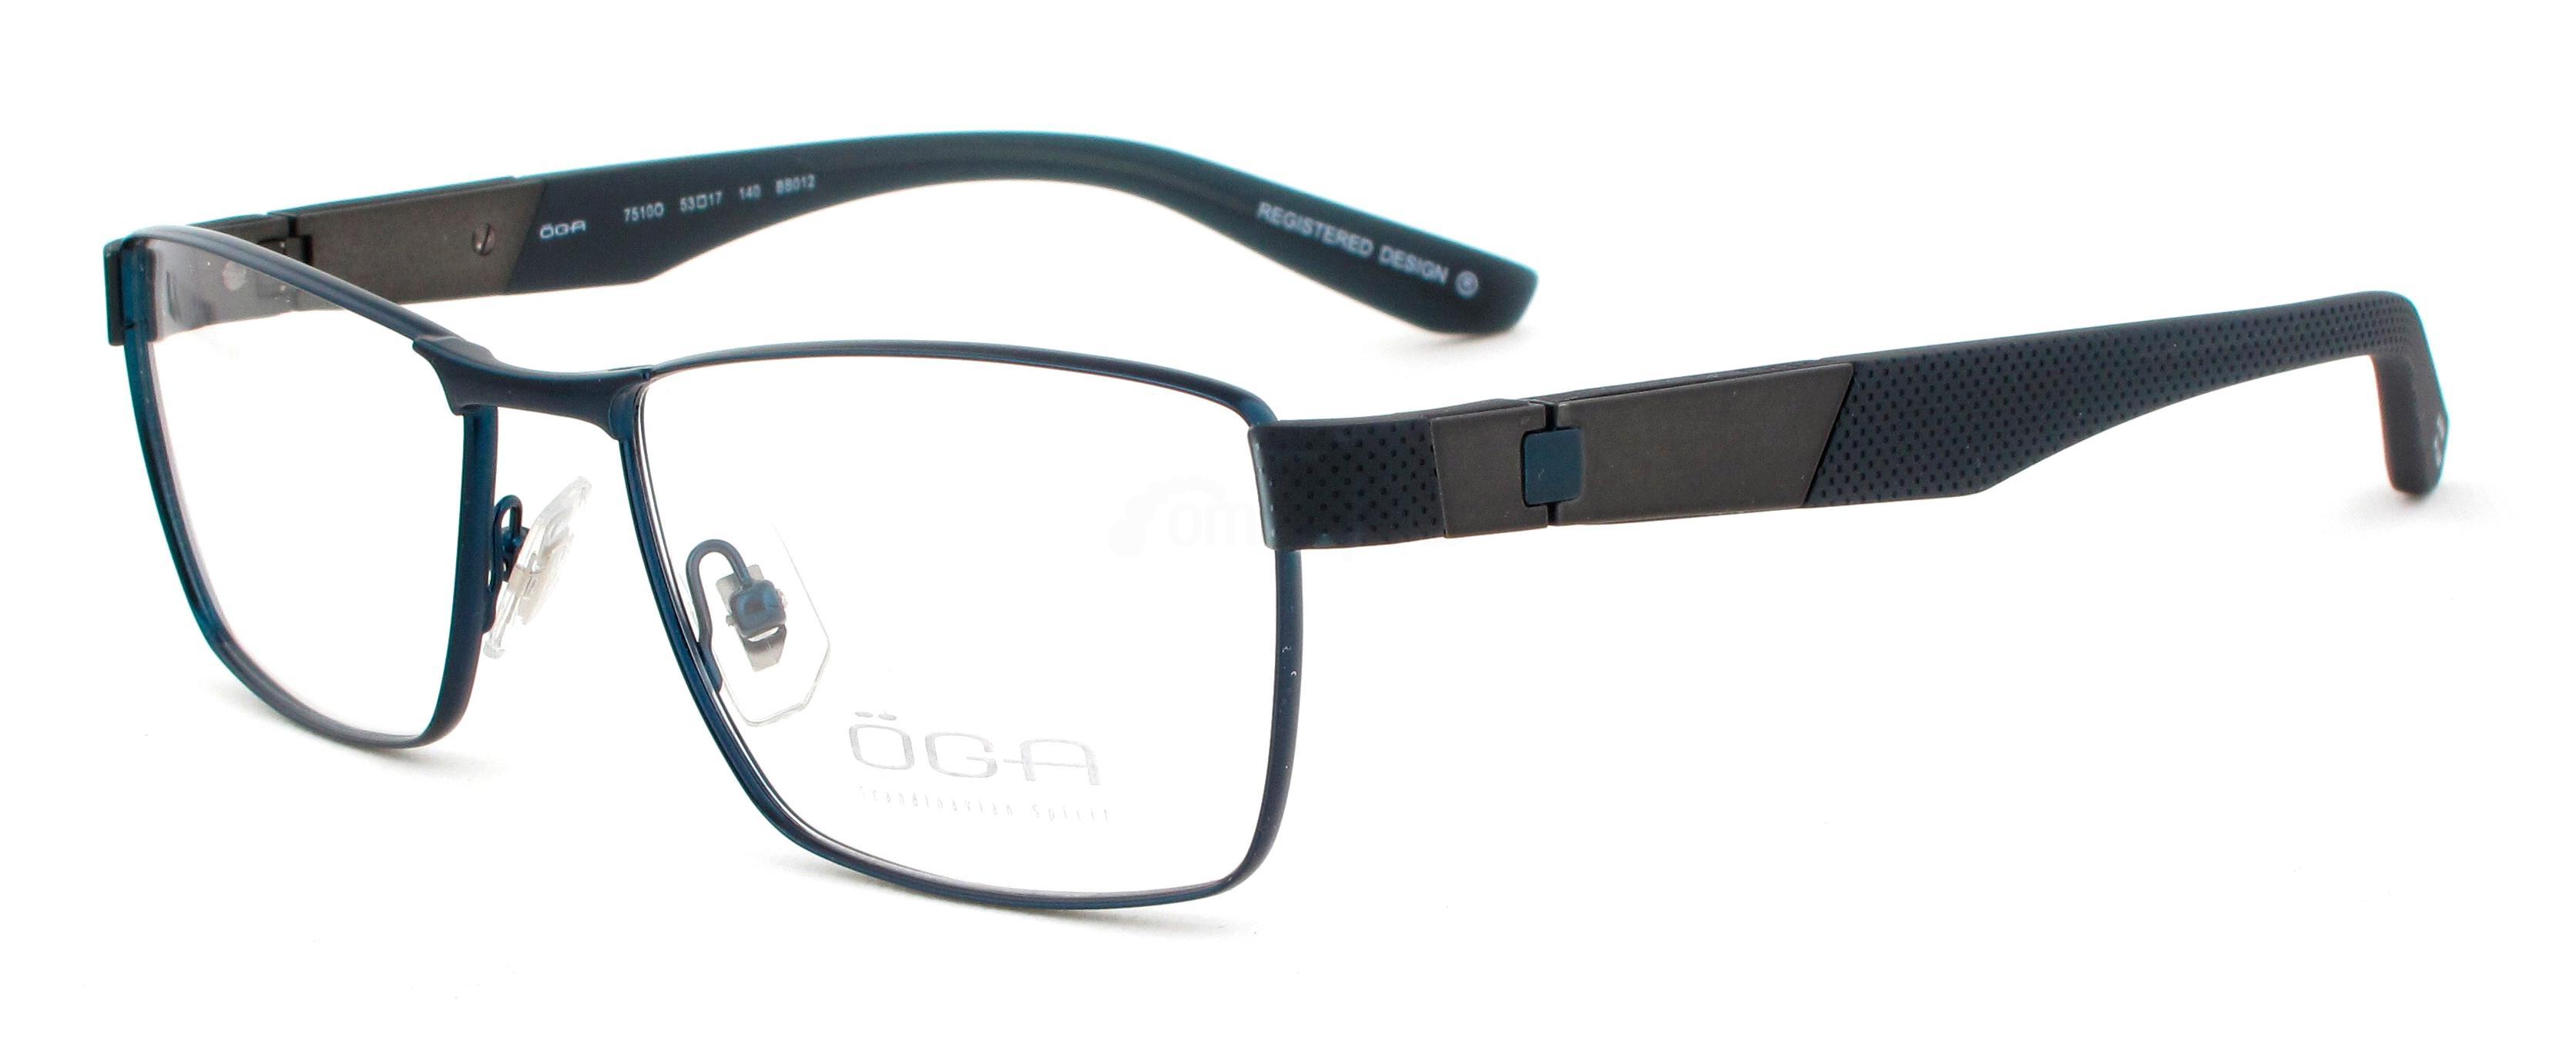 BB012 7510O FALK 3 Glasses, ÖGA Scandinavian Spirit